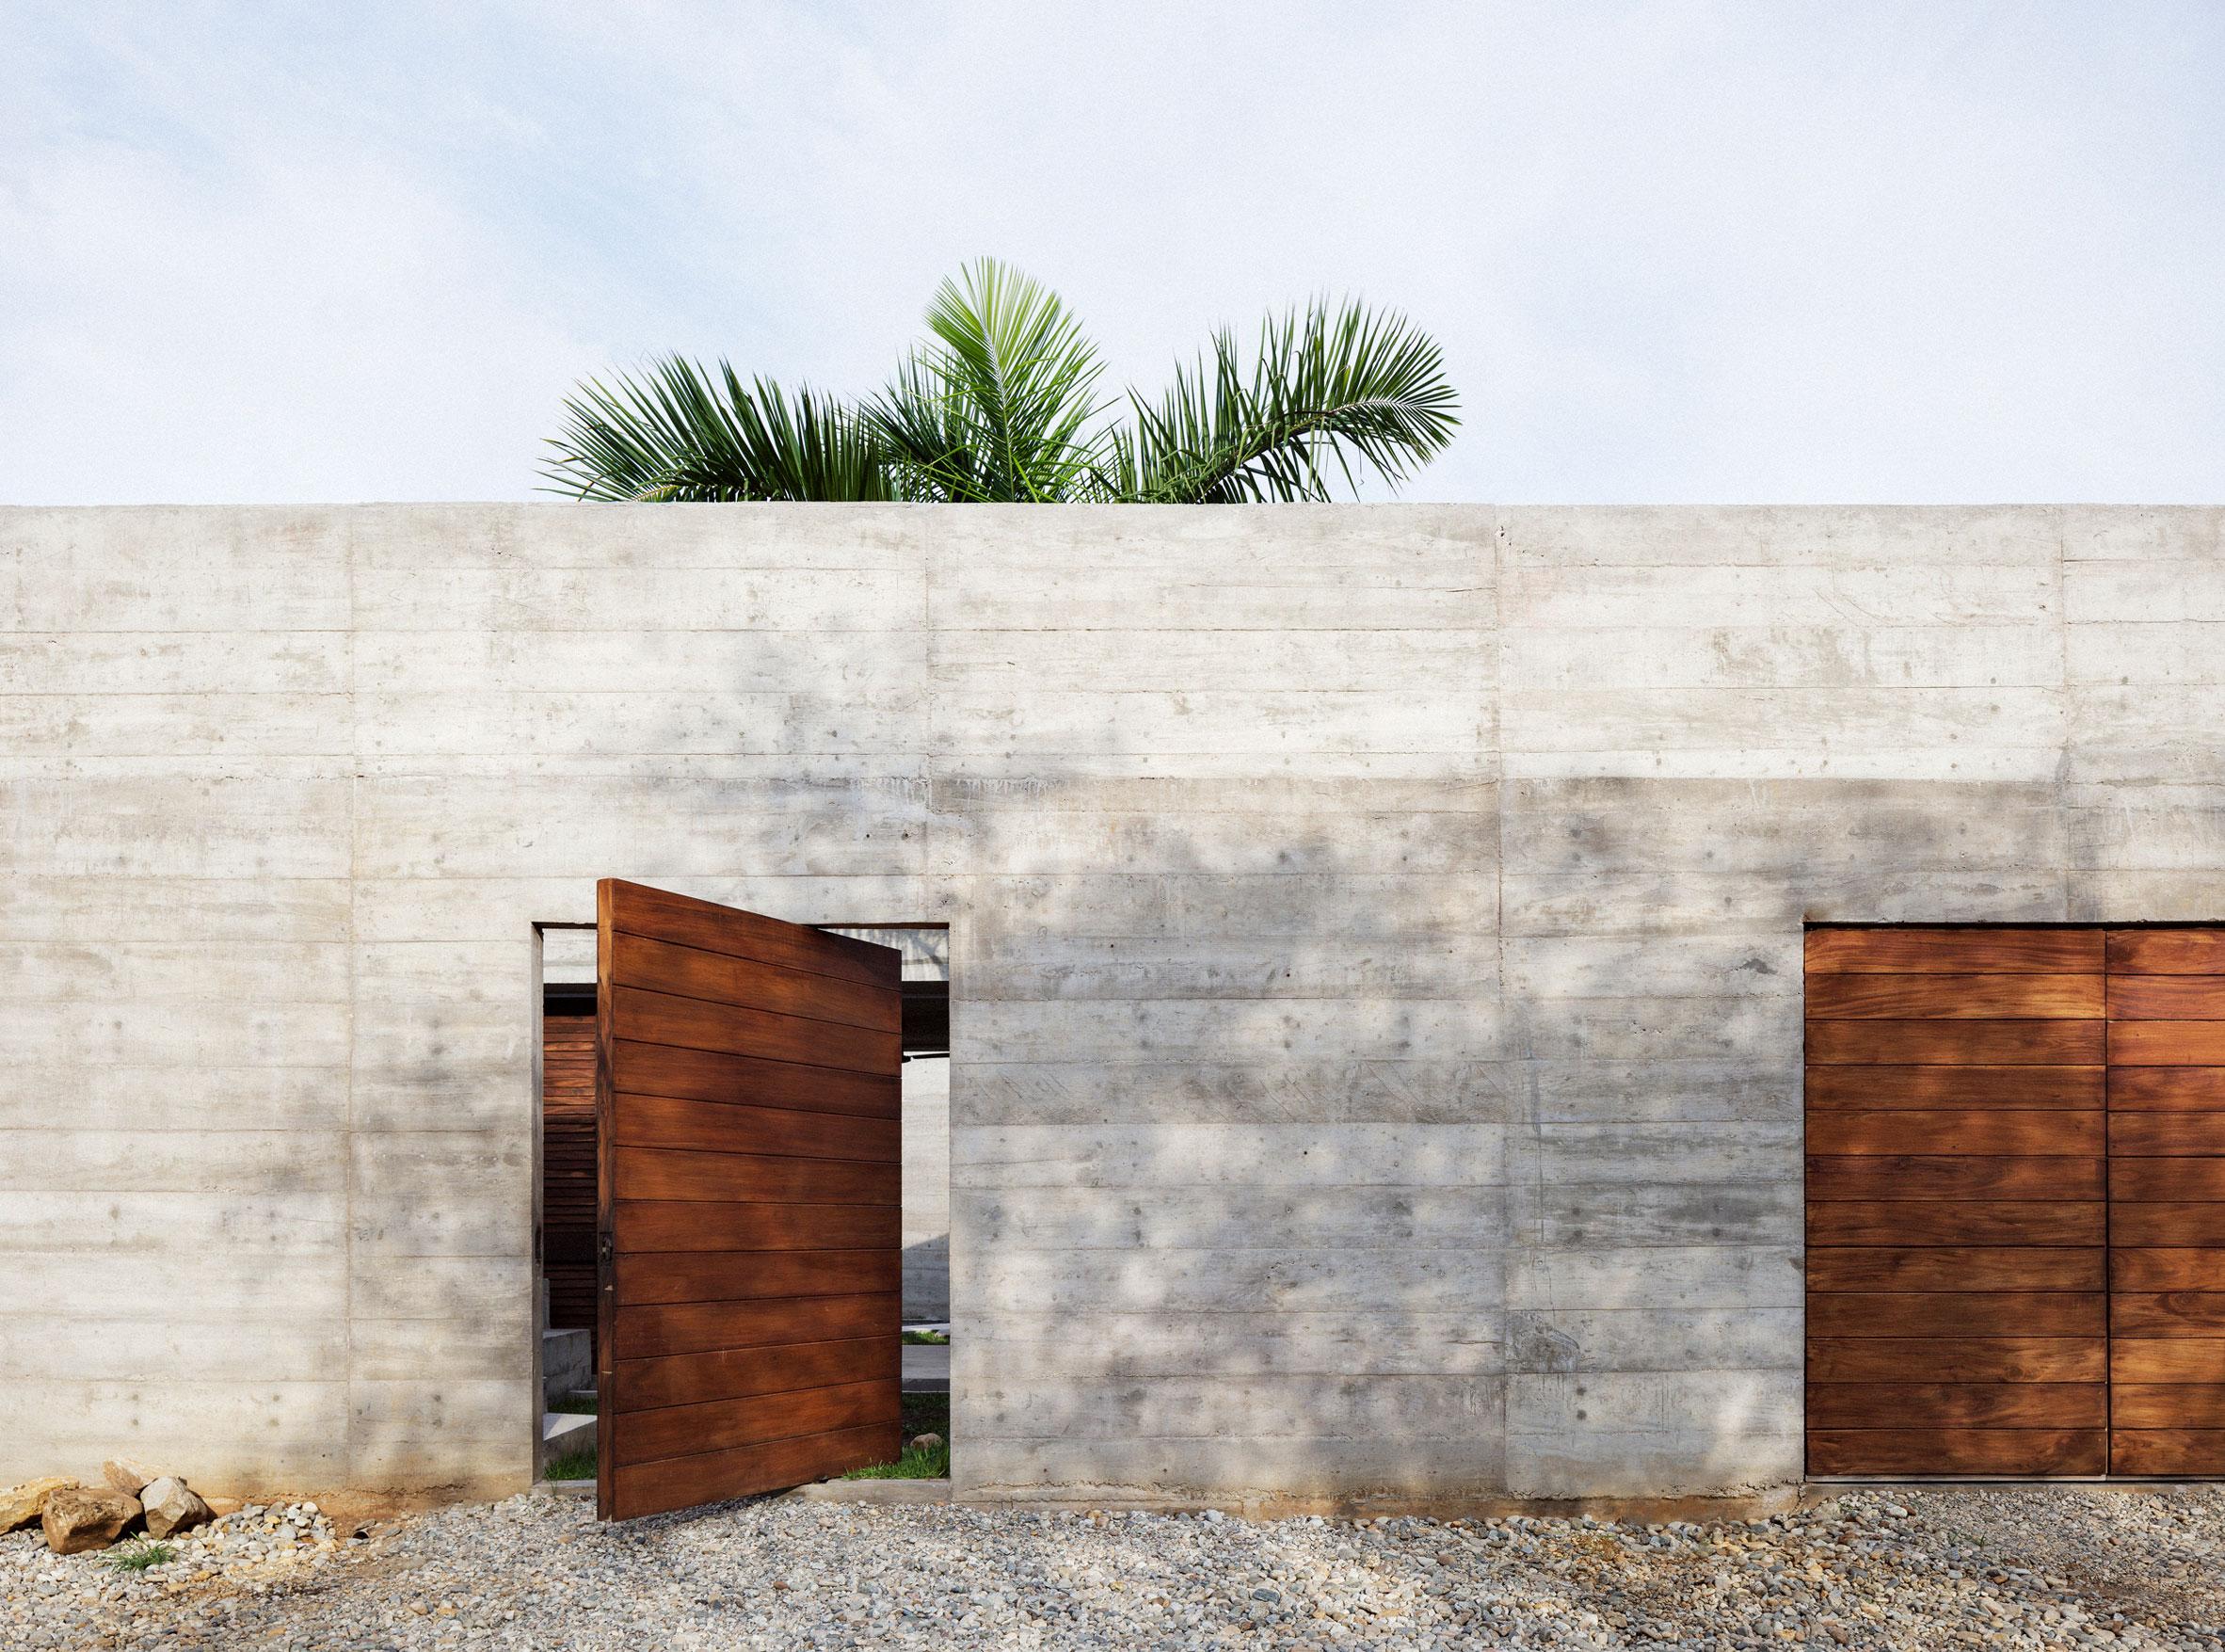 Zicatela House, Zicatela by Ludwig Godefroy and Emmanuel Picault